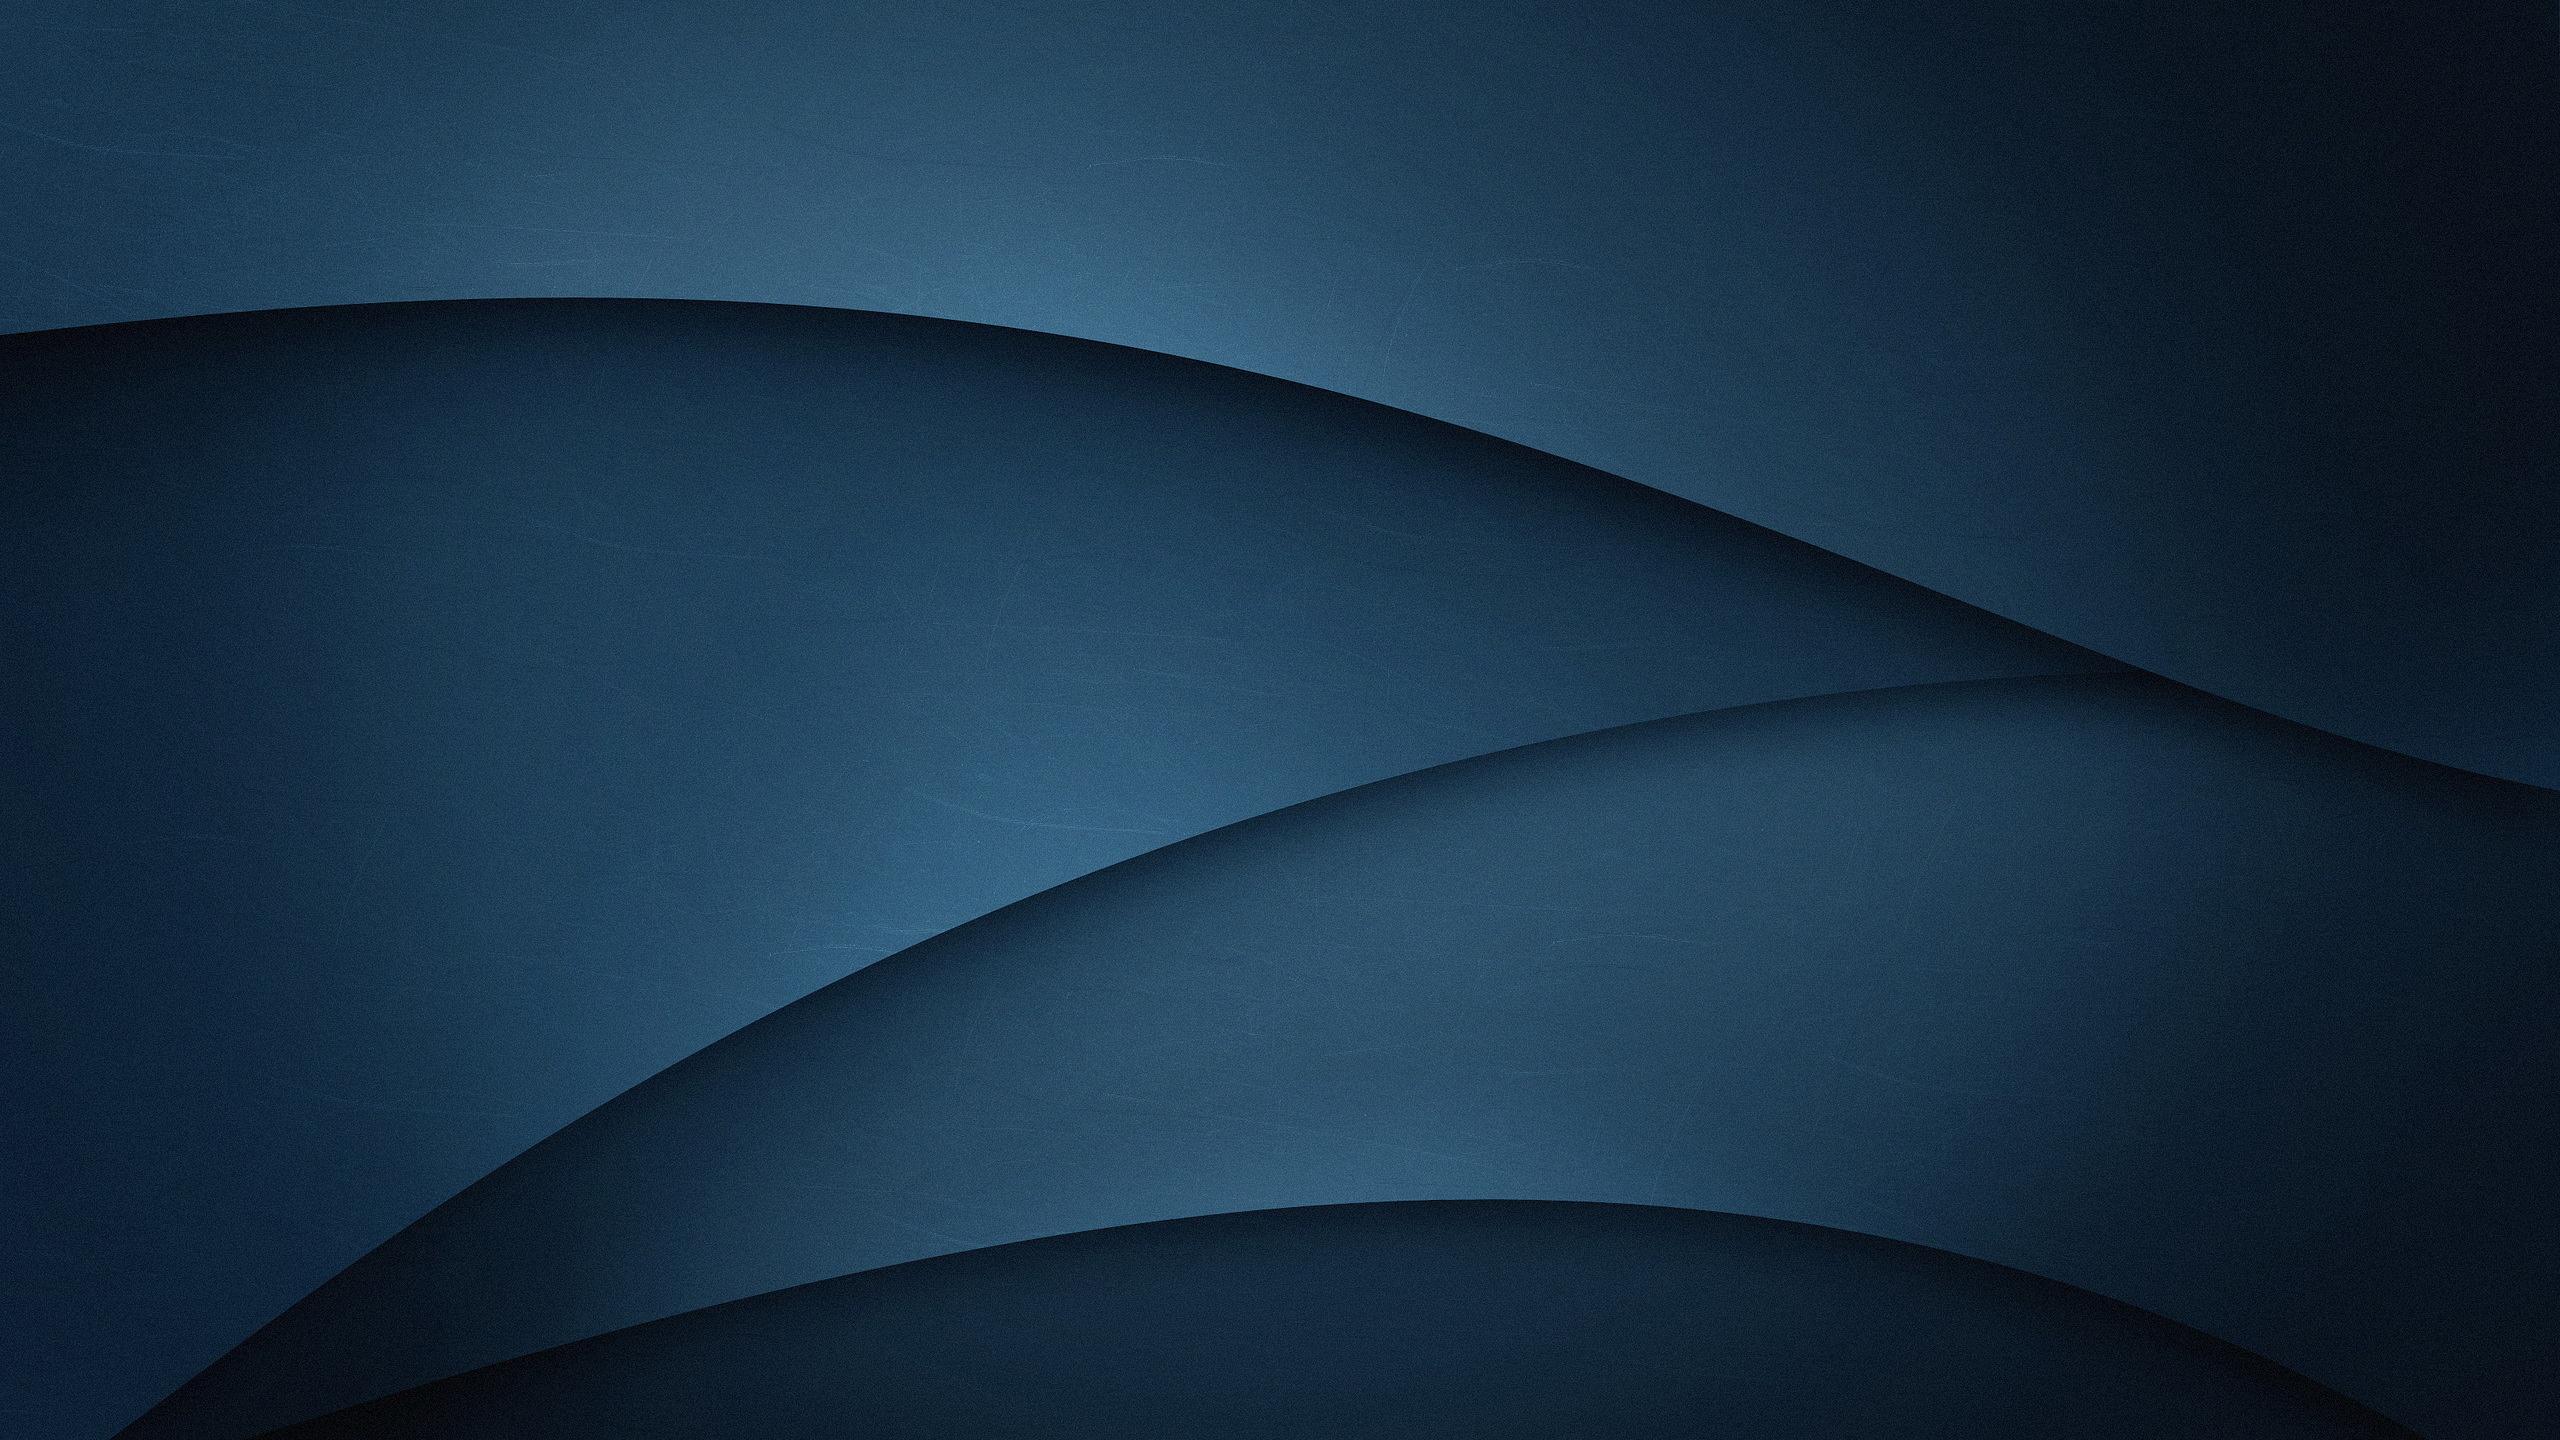 Download 2560x1440 wallpaper dark blue, gradient, abstract ...